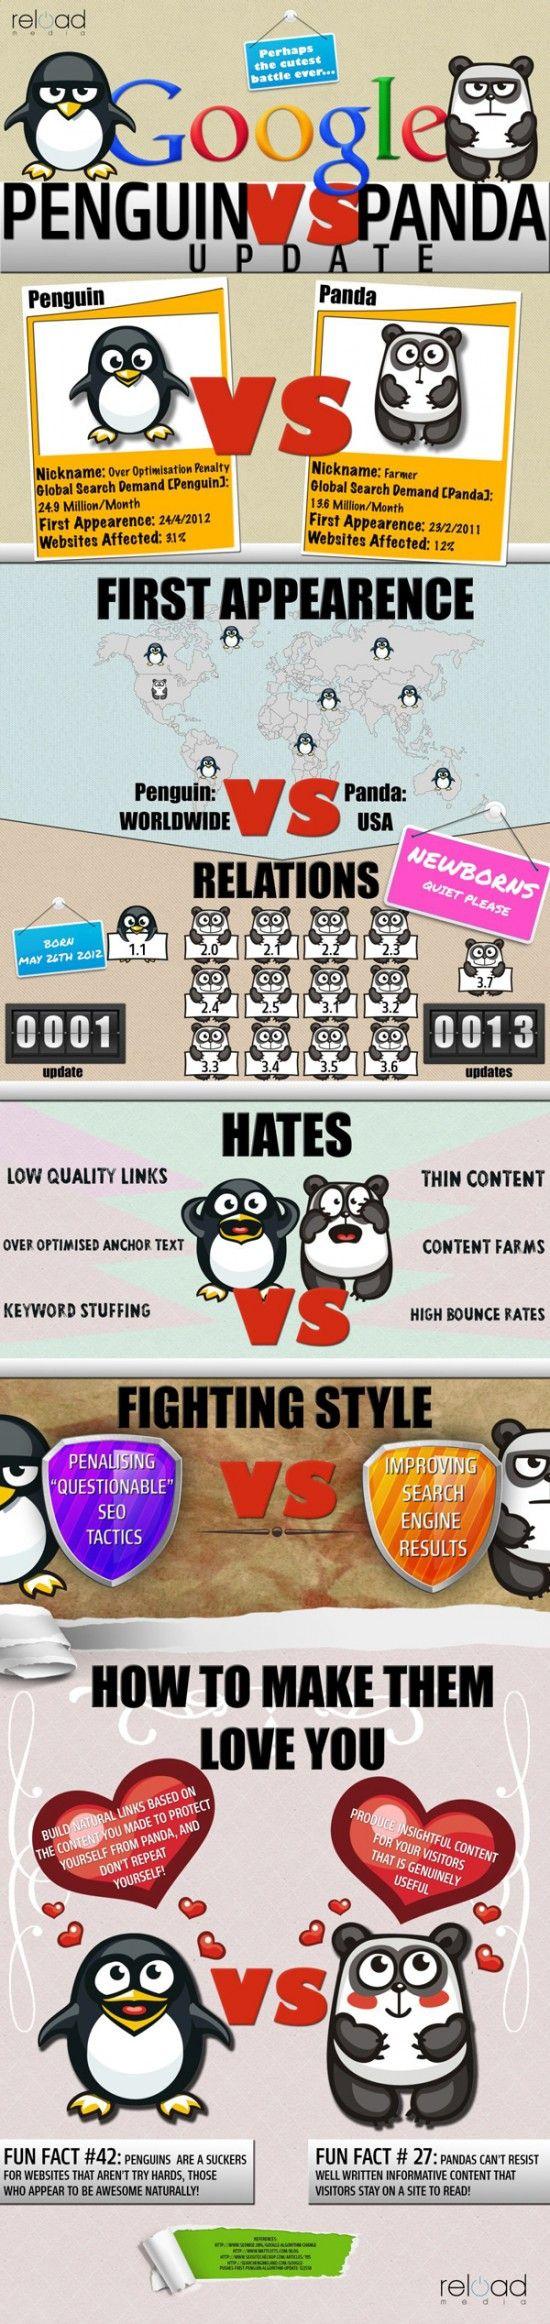 Google Penguin VS Panda #SEO#Google Penguin